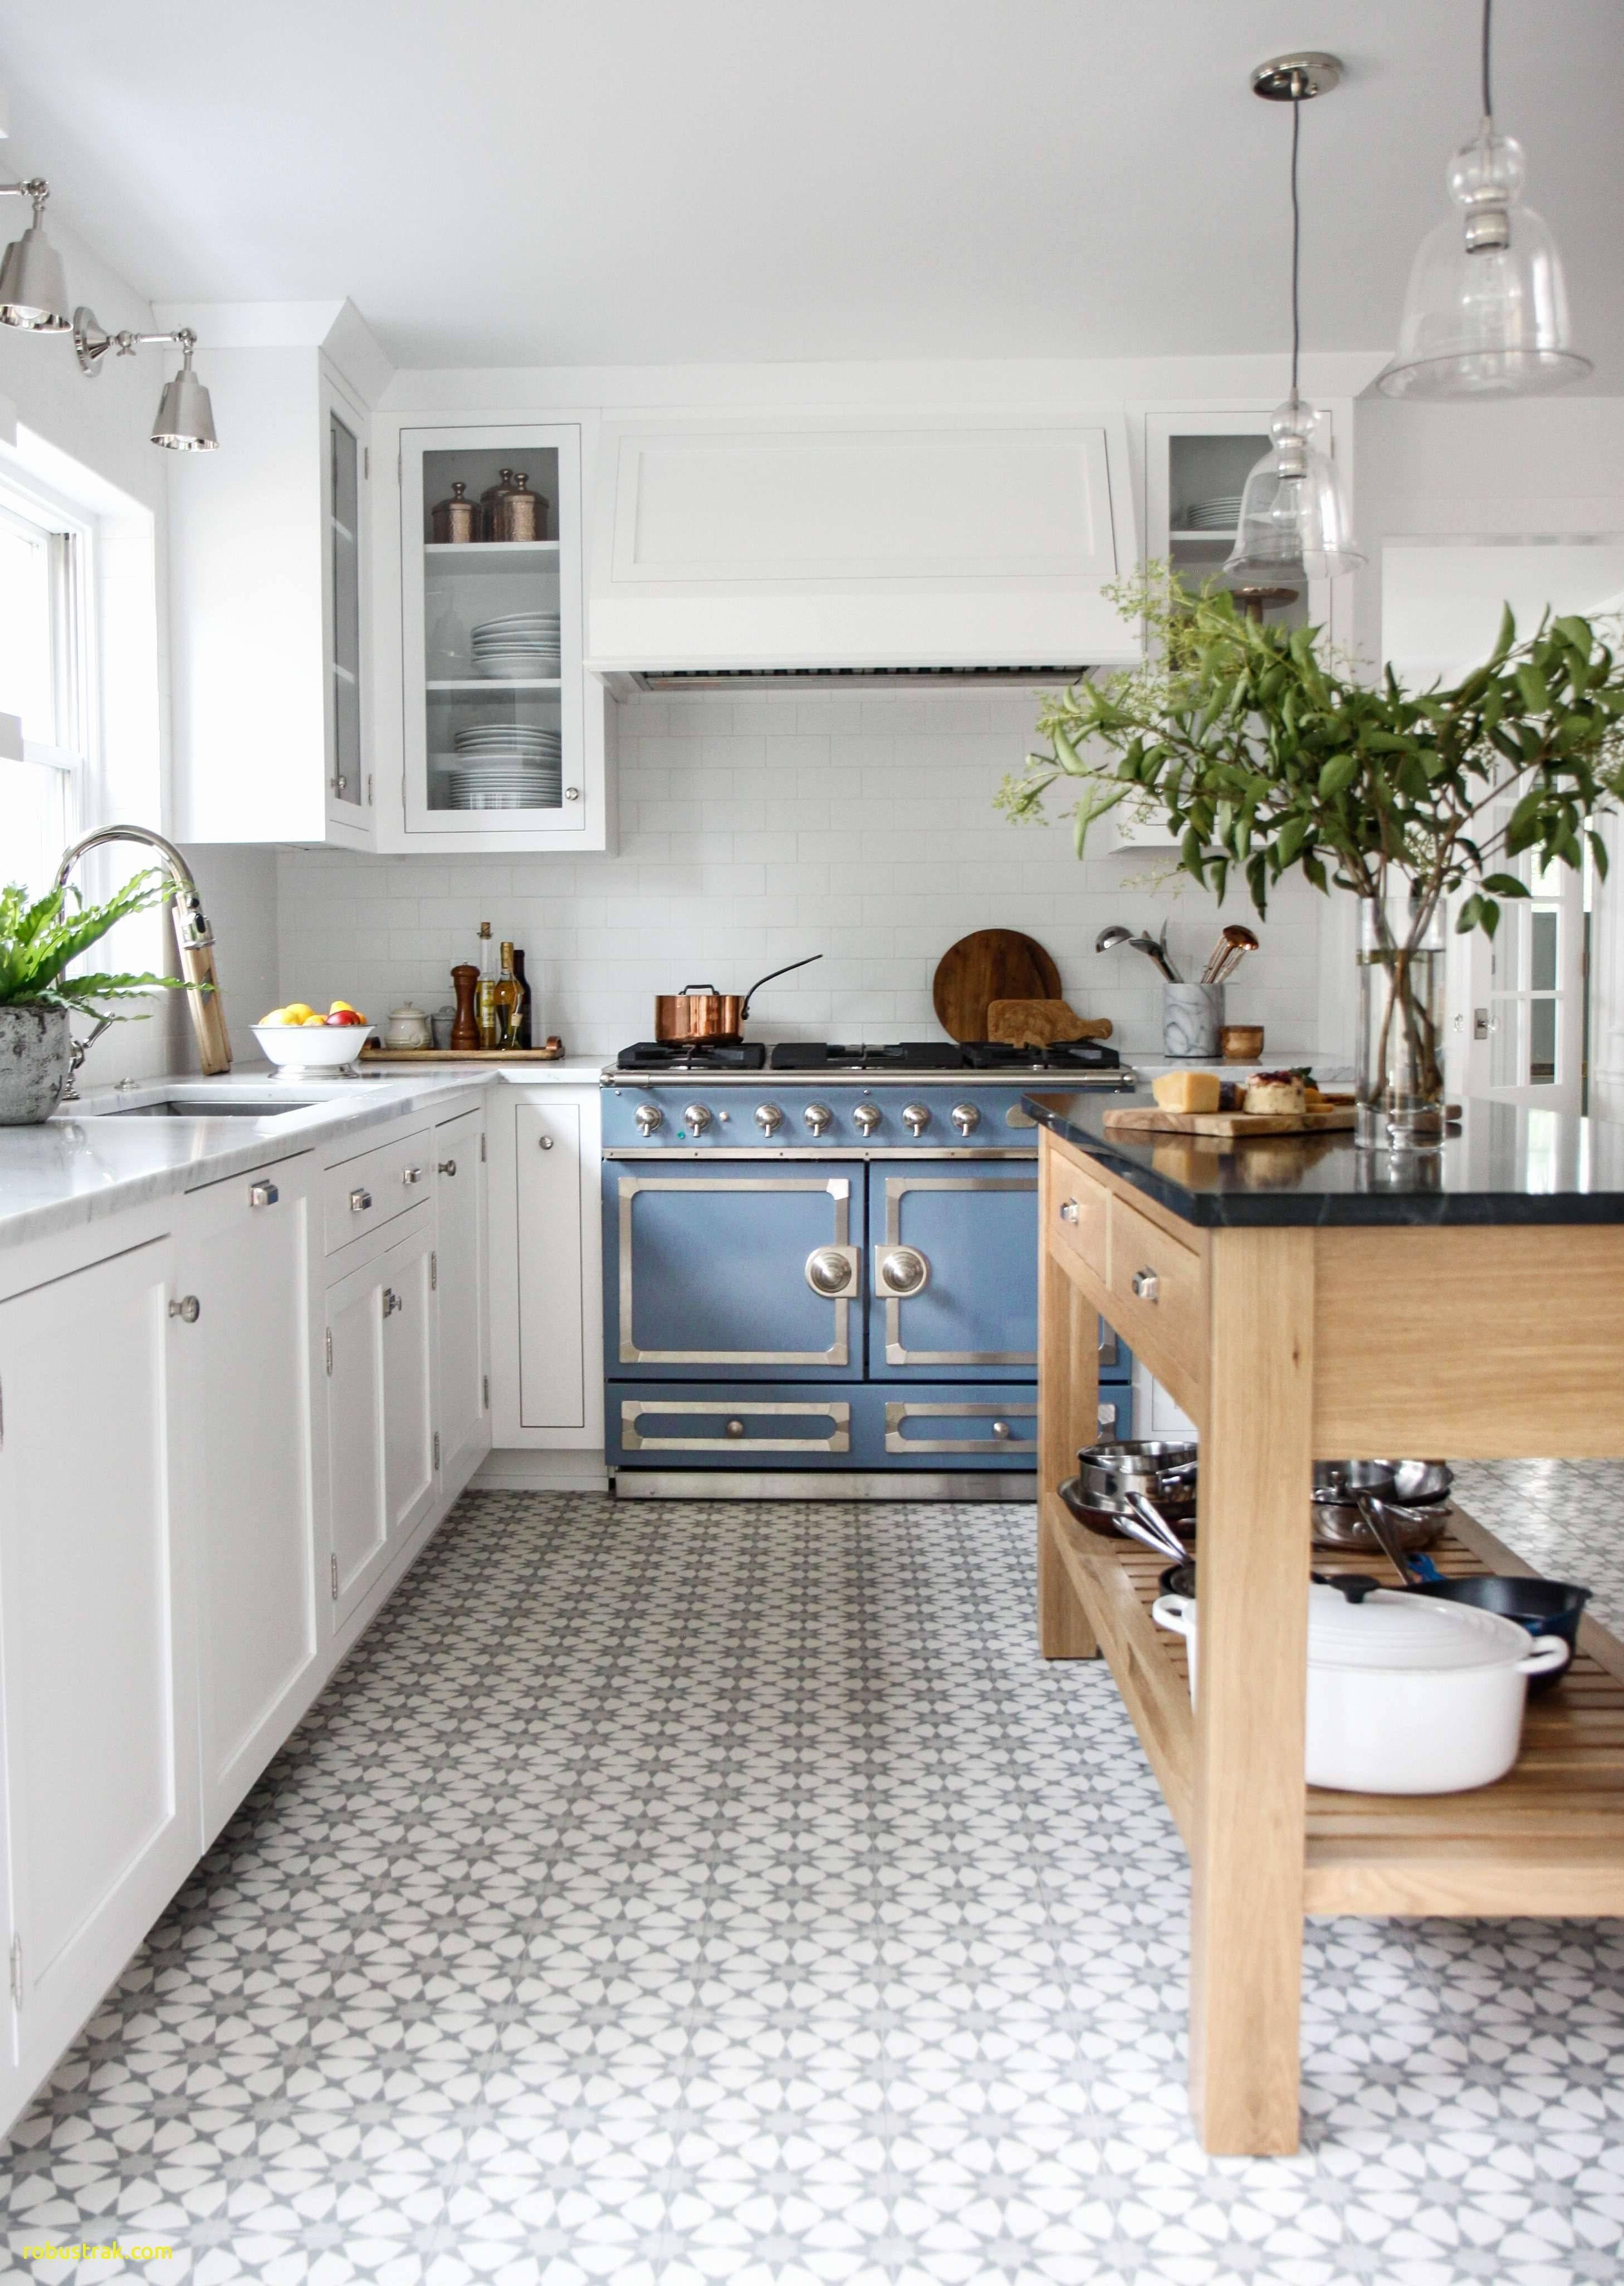 20 unique design for houzz kitchen cabinets with glass doors of houzz kitchen backsplash tile